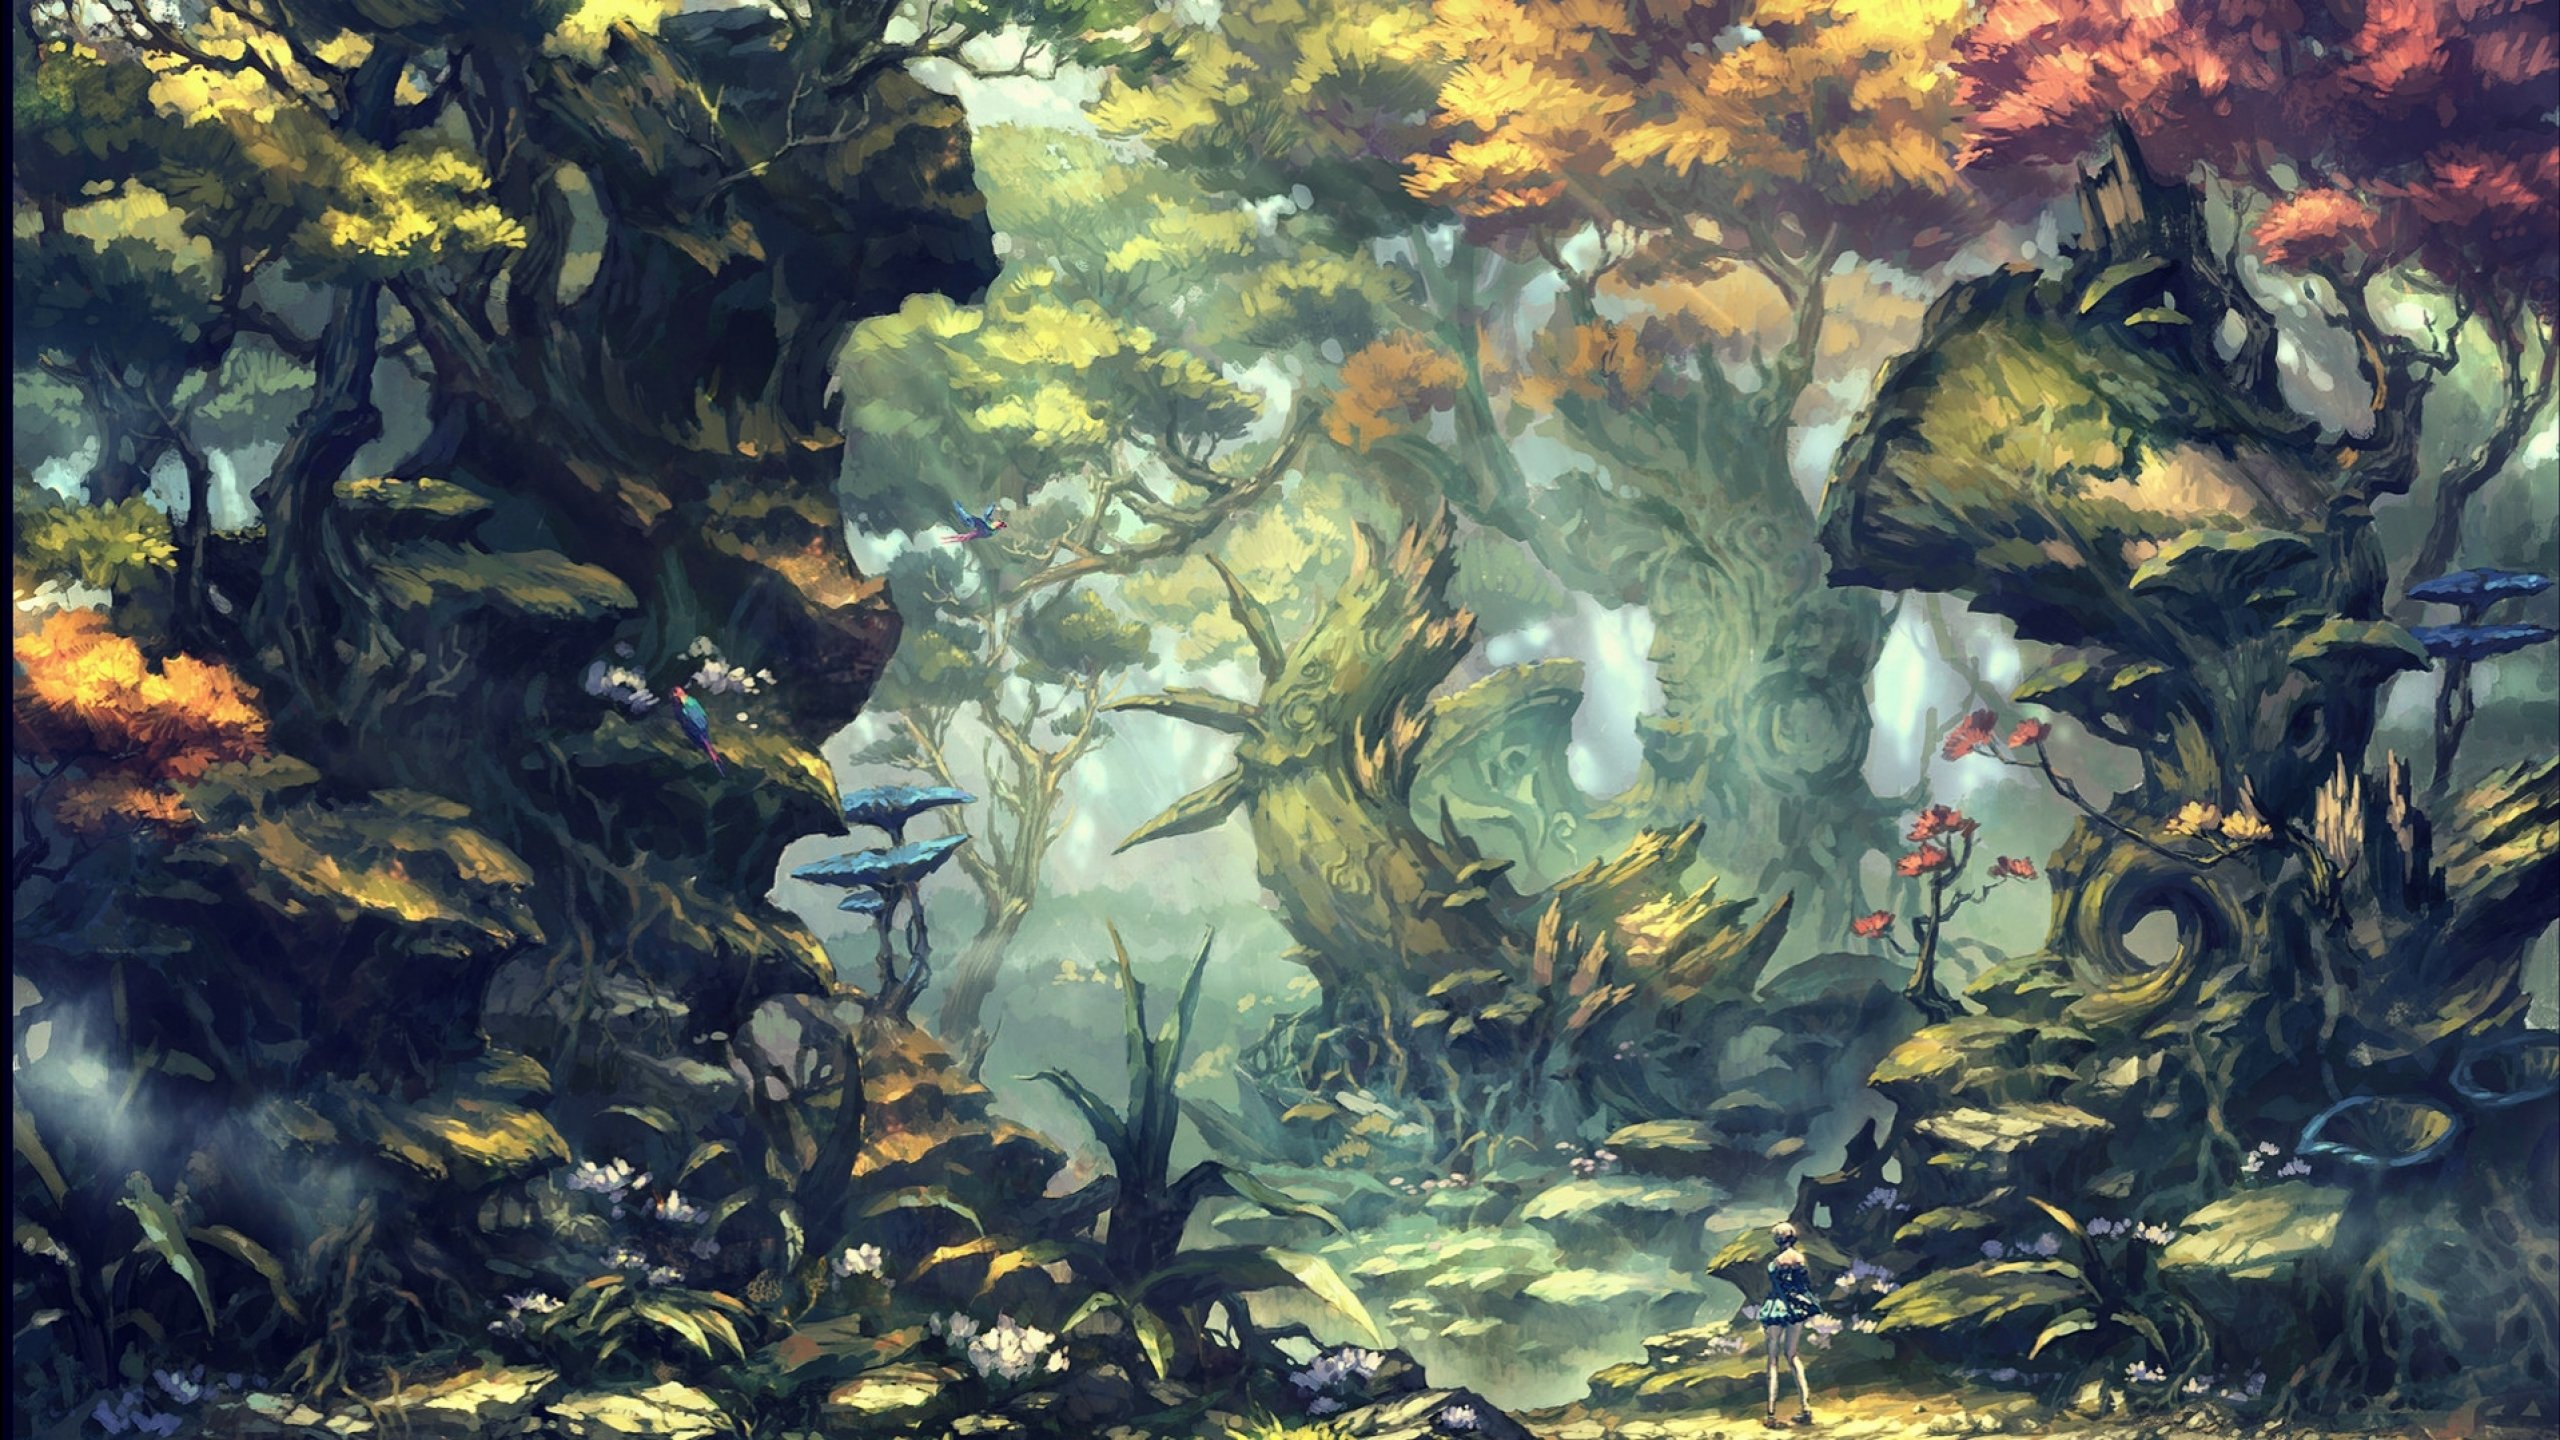 magical fantasy landscapes landscape - photo #31